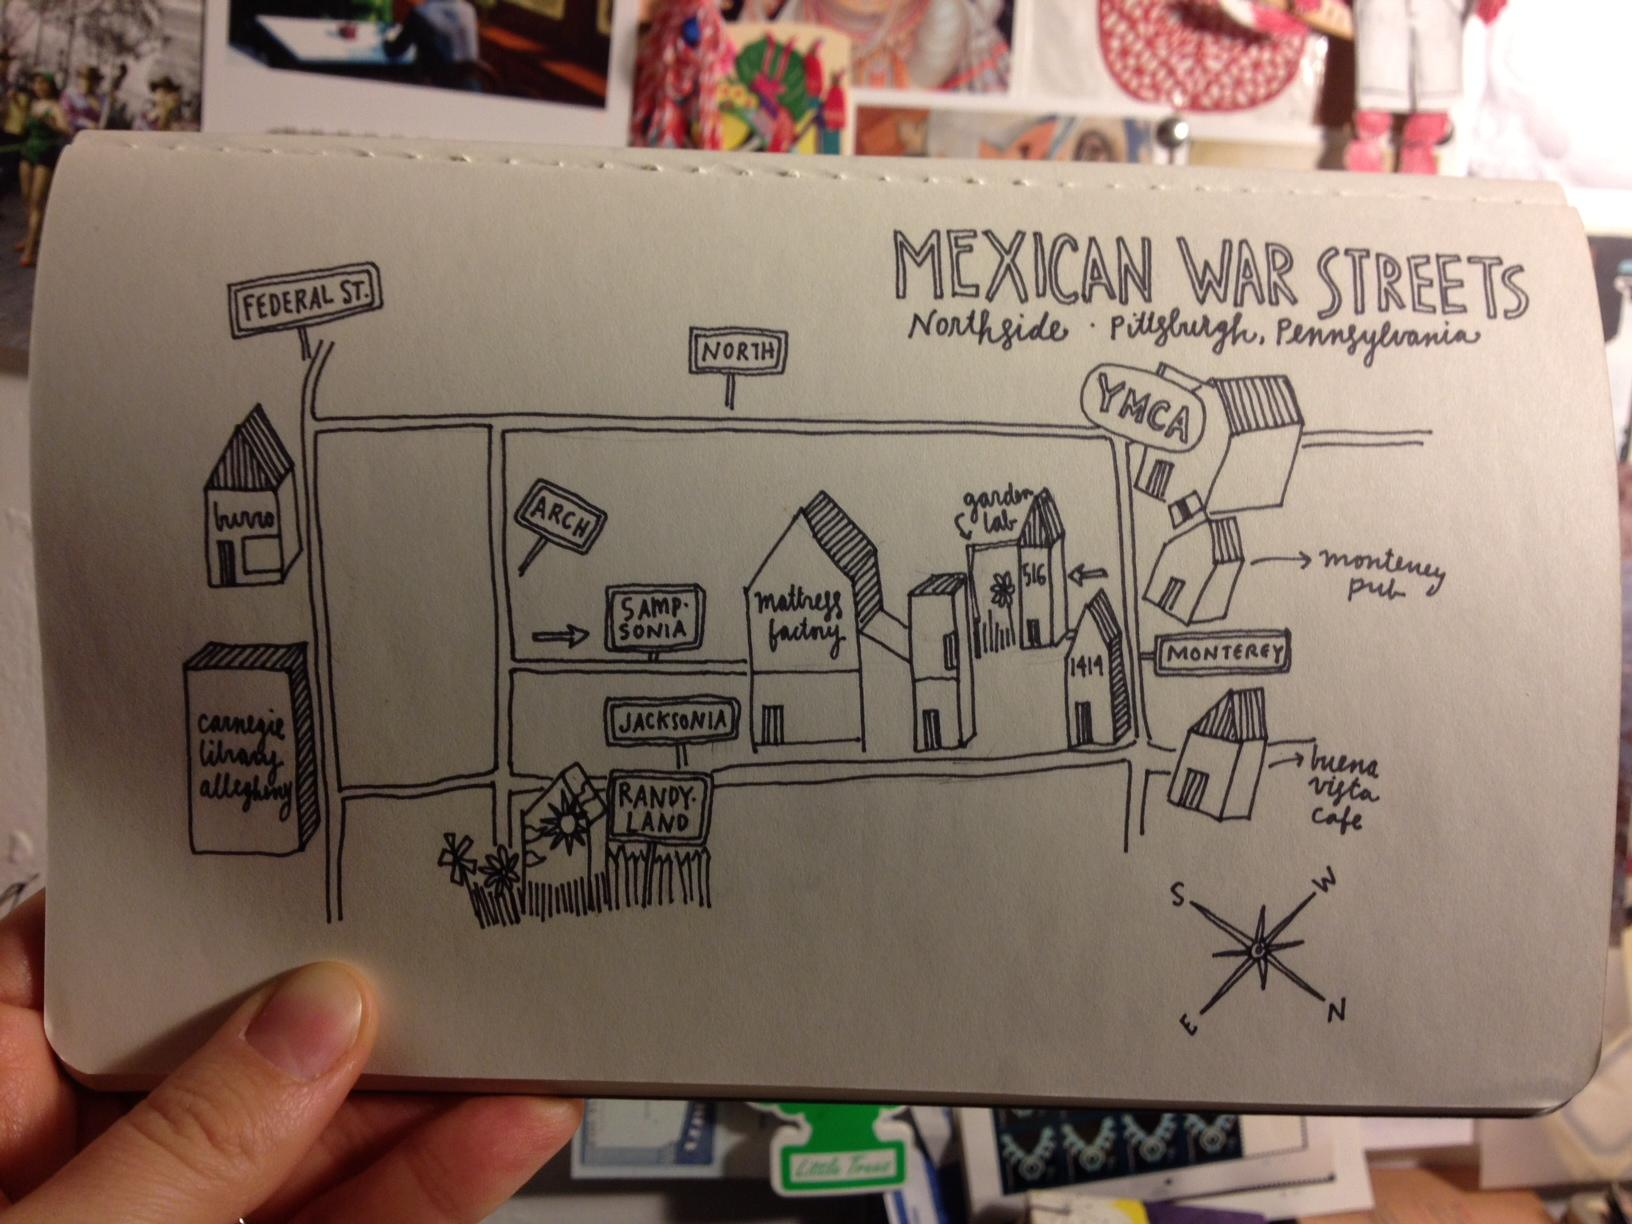 pittsburgh // neighborhoods // drawings  - image 5 - student project